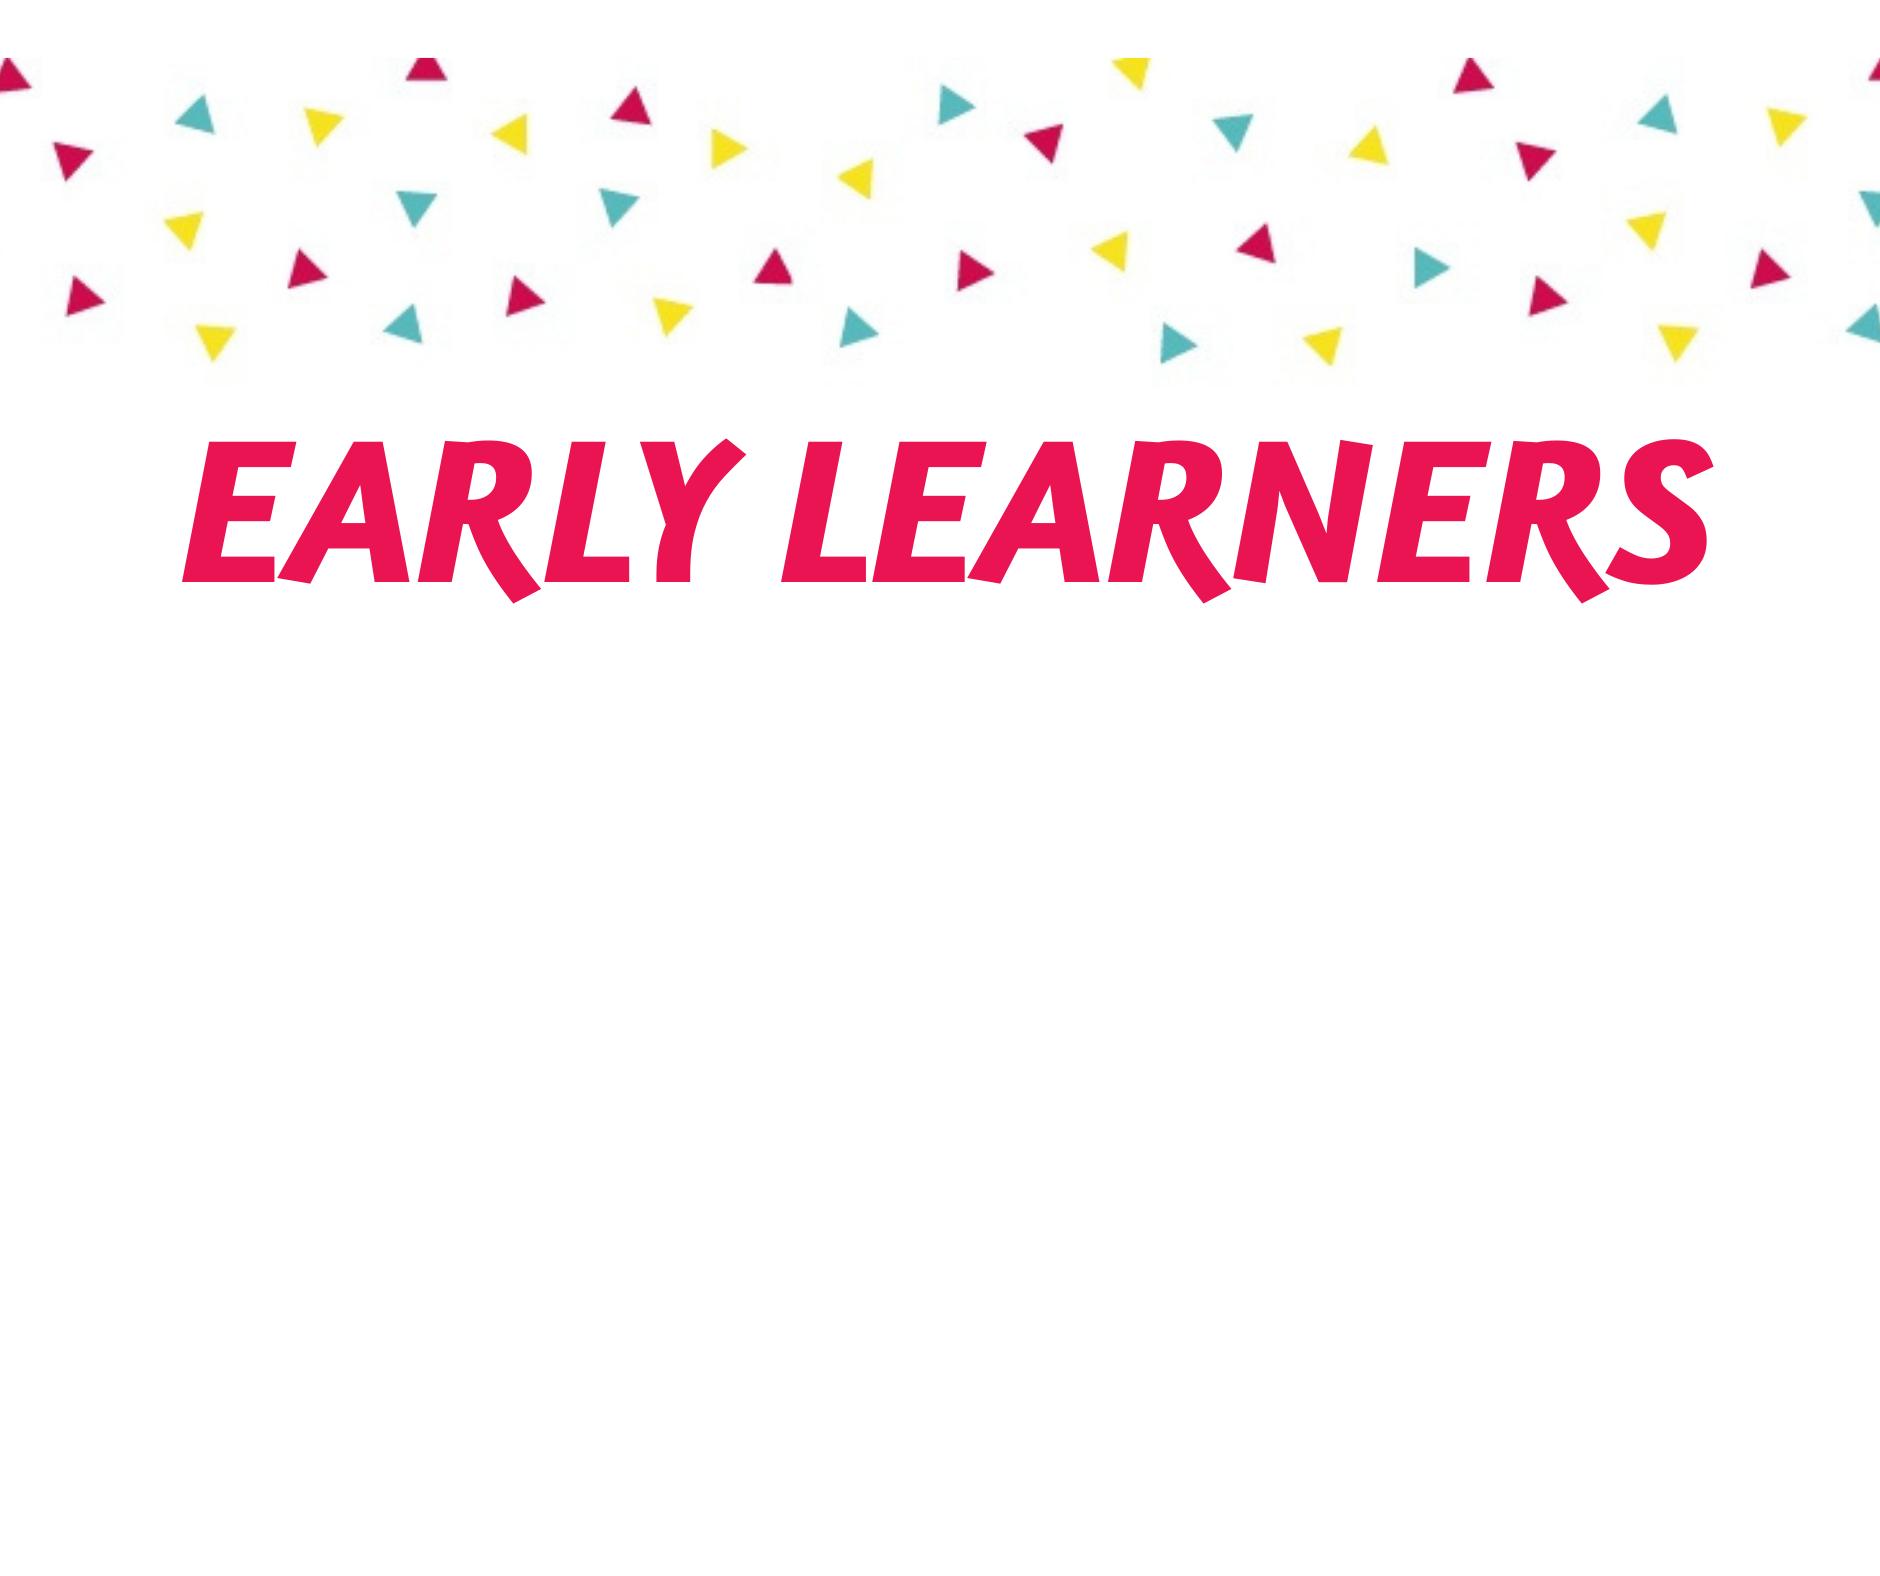 Early Learners